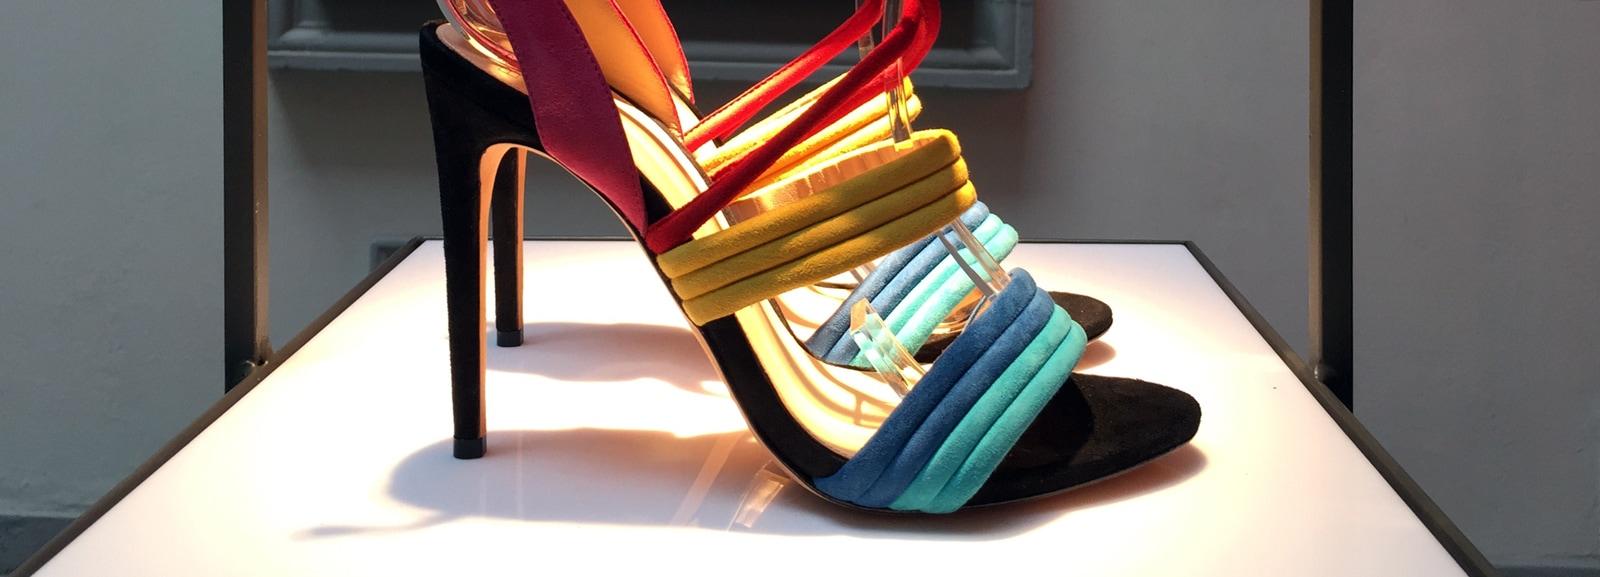 desktop-scarpe-pe17-milano